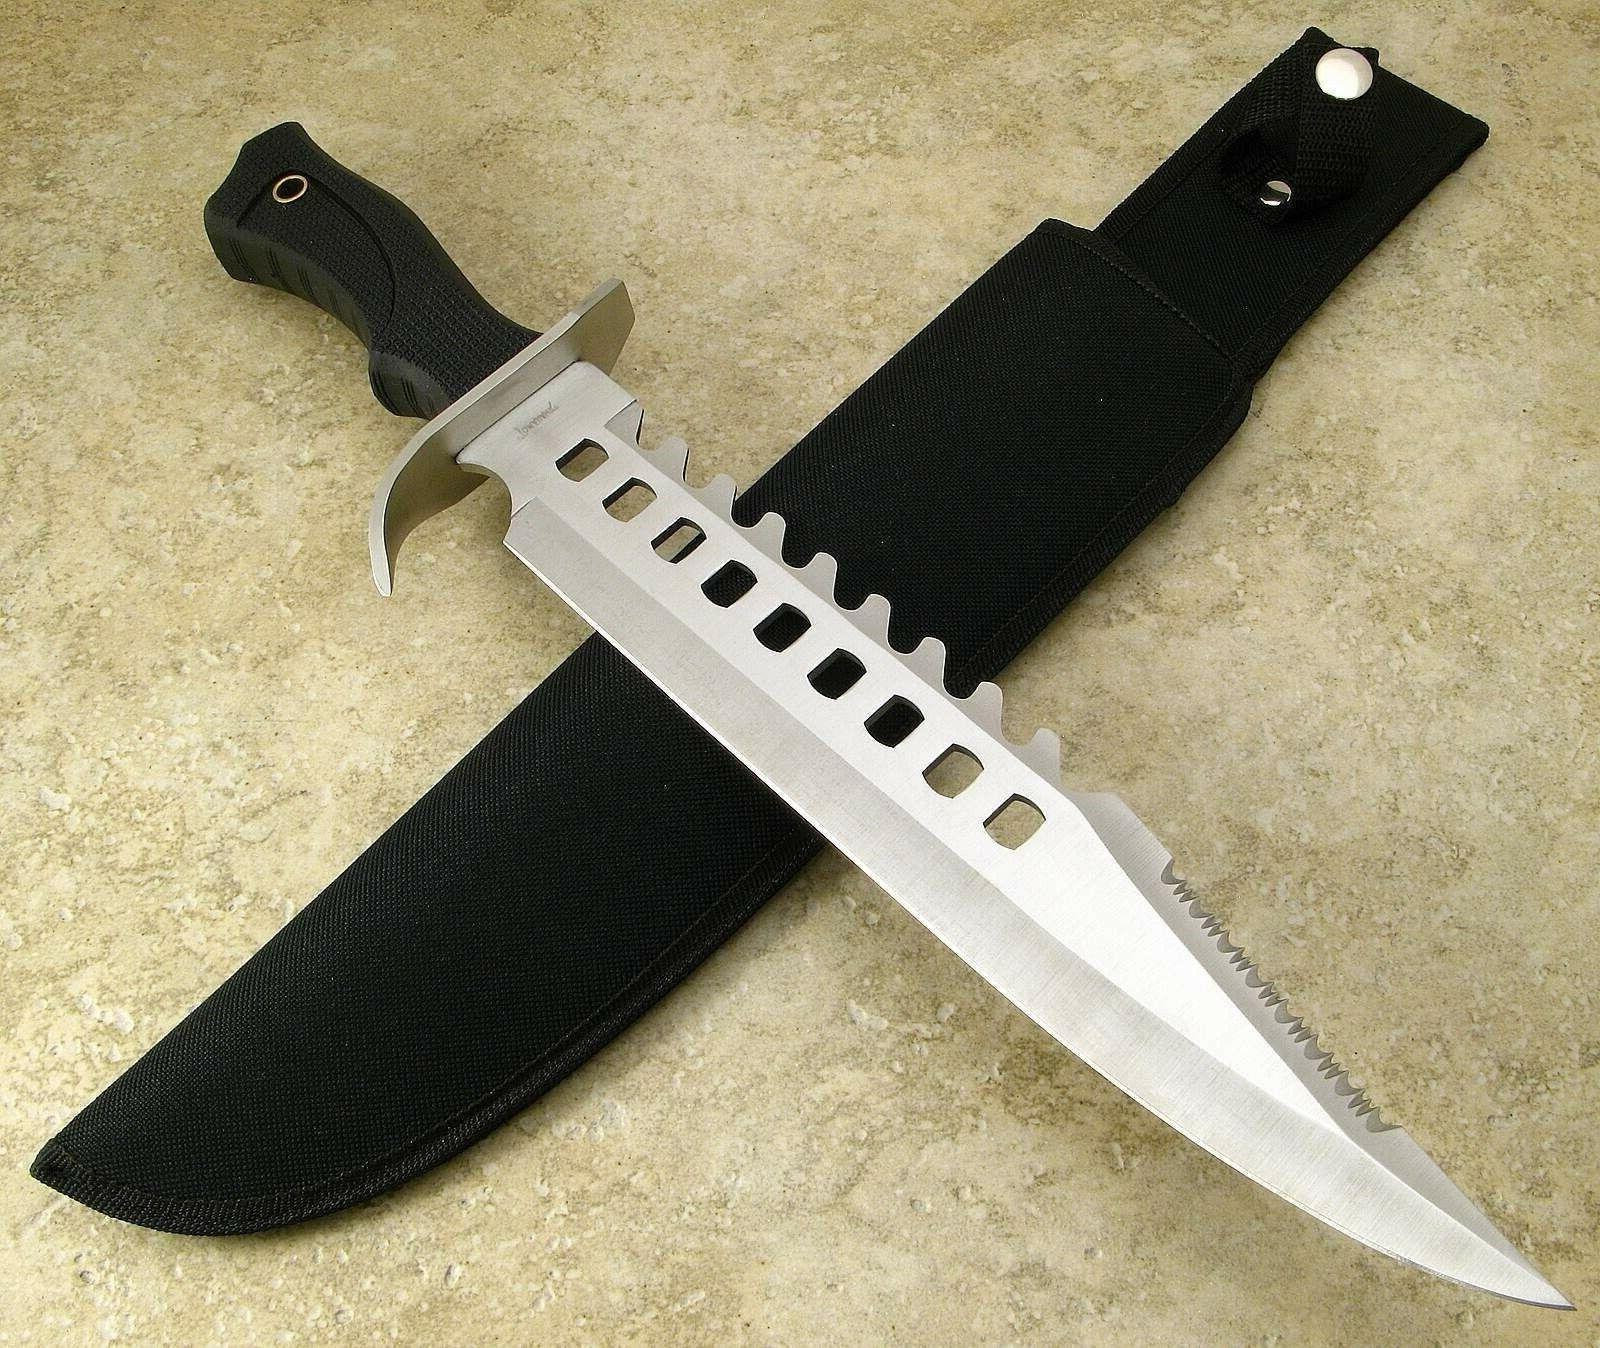 wicked fantasy bowie knife